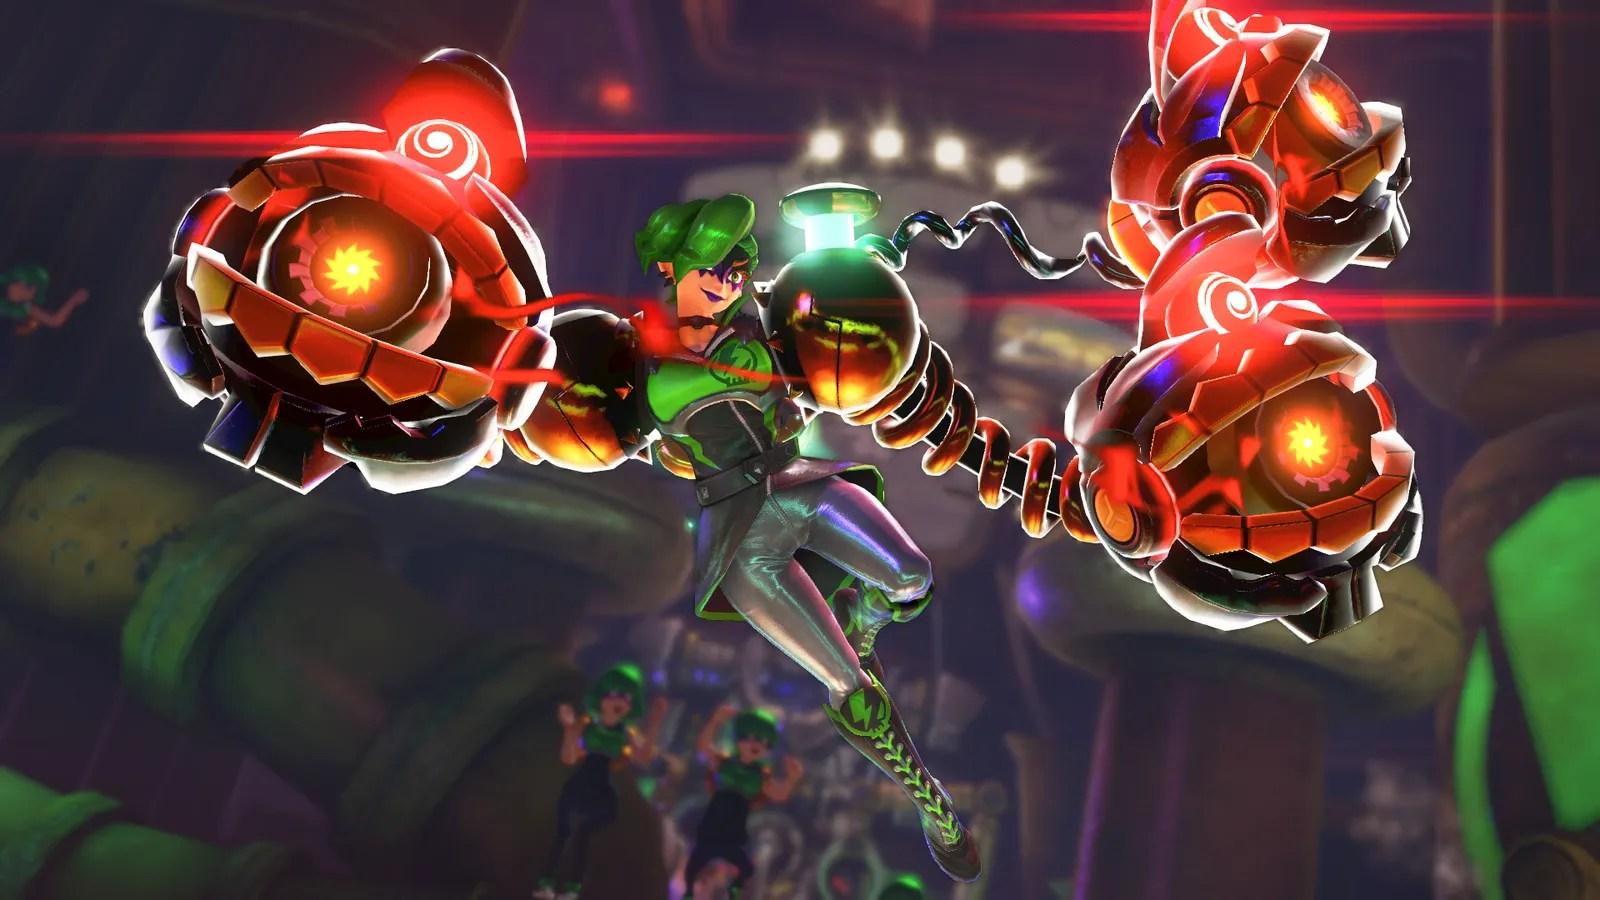 Pop Art Wallpaper Girl Nintendo S Arms Gets Its Last New Character